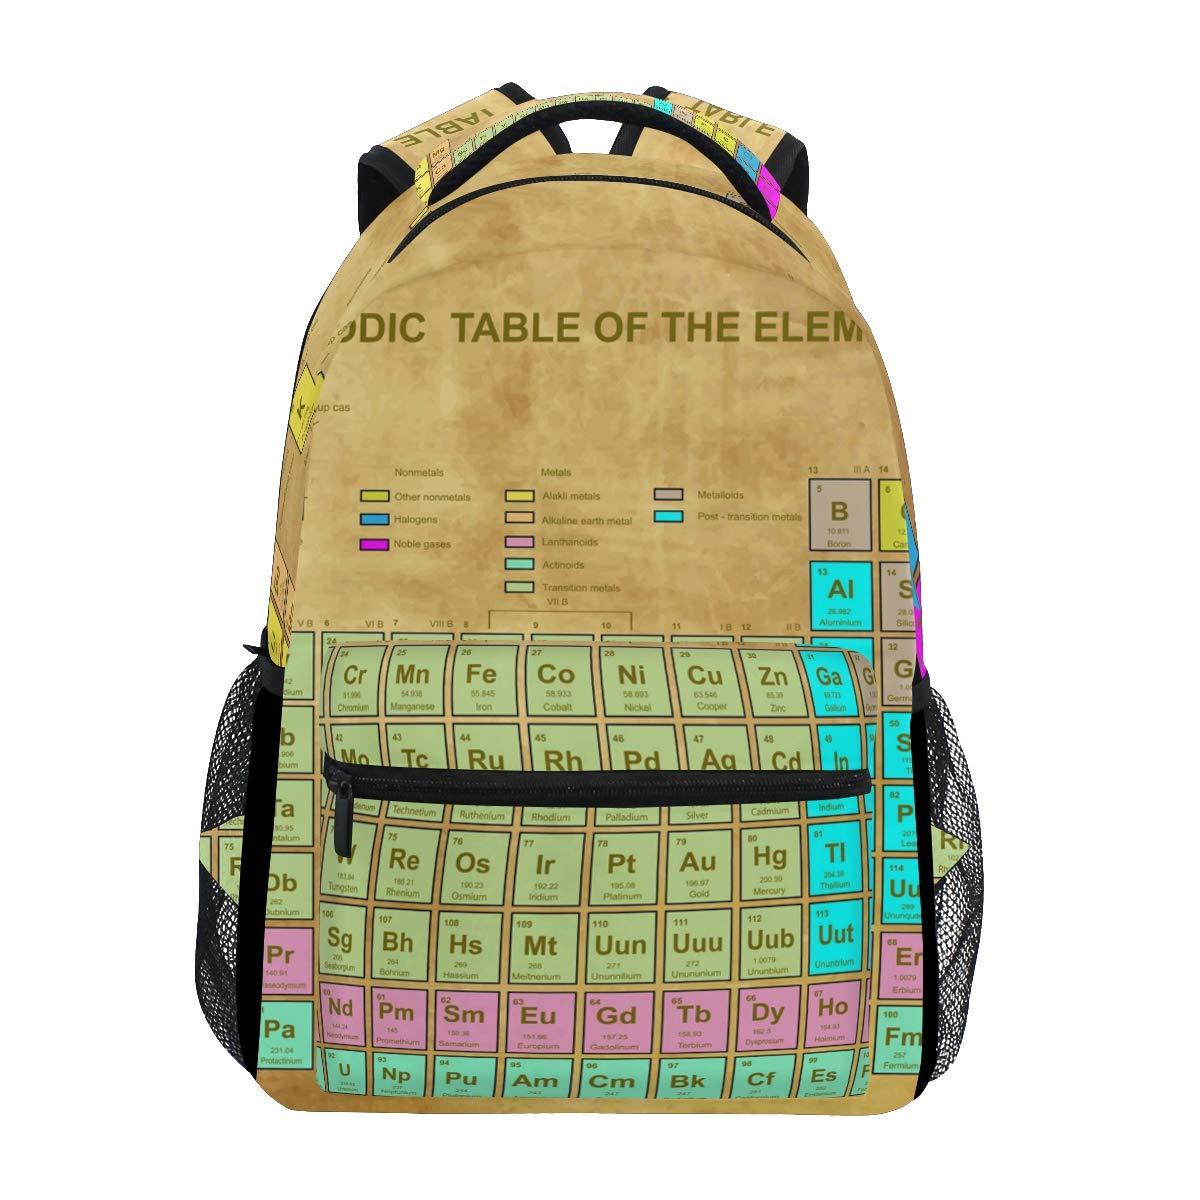 DOSHINE g15699953p203c237s337, Unisex-Erwachsene Kinderrucksack Mehrfarbig Mehrfarbig 11.5''x8''x16''